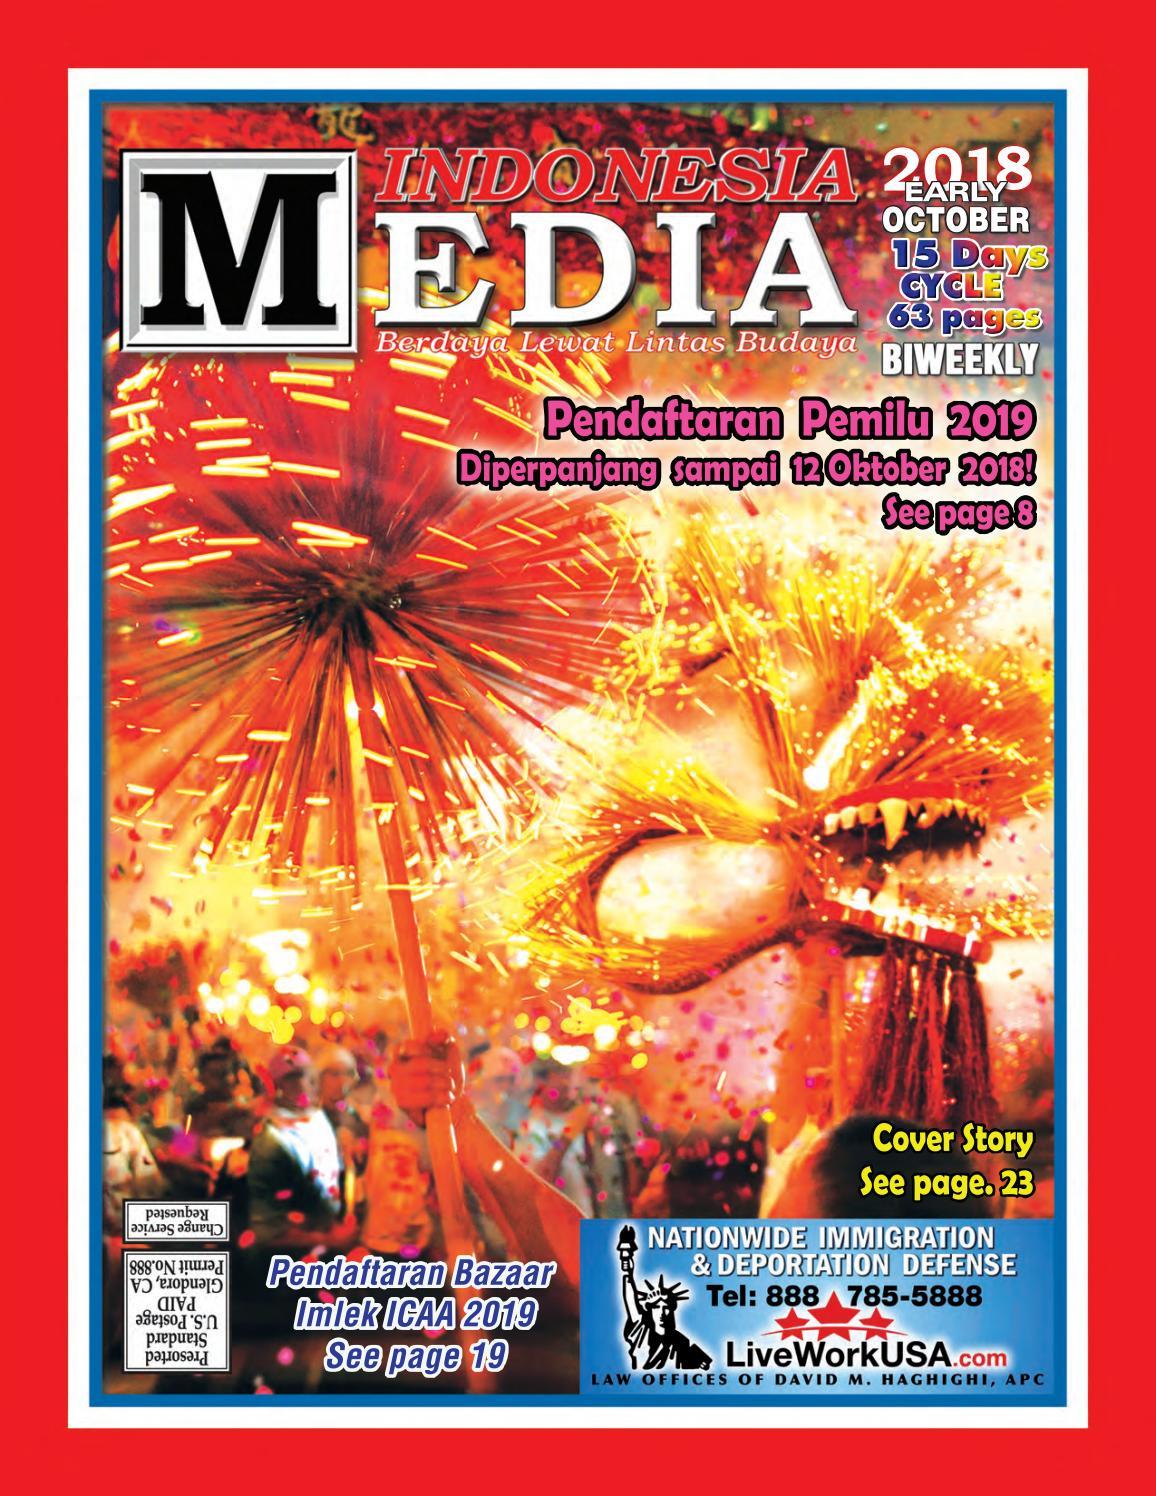 Indonesia Media Issue Early October 2018 By Issuu Produk Ukm Bumn Kain Batik Middle Premium 3 Bendera 01